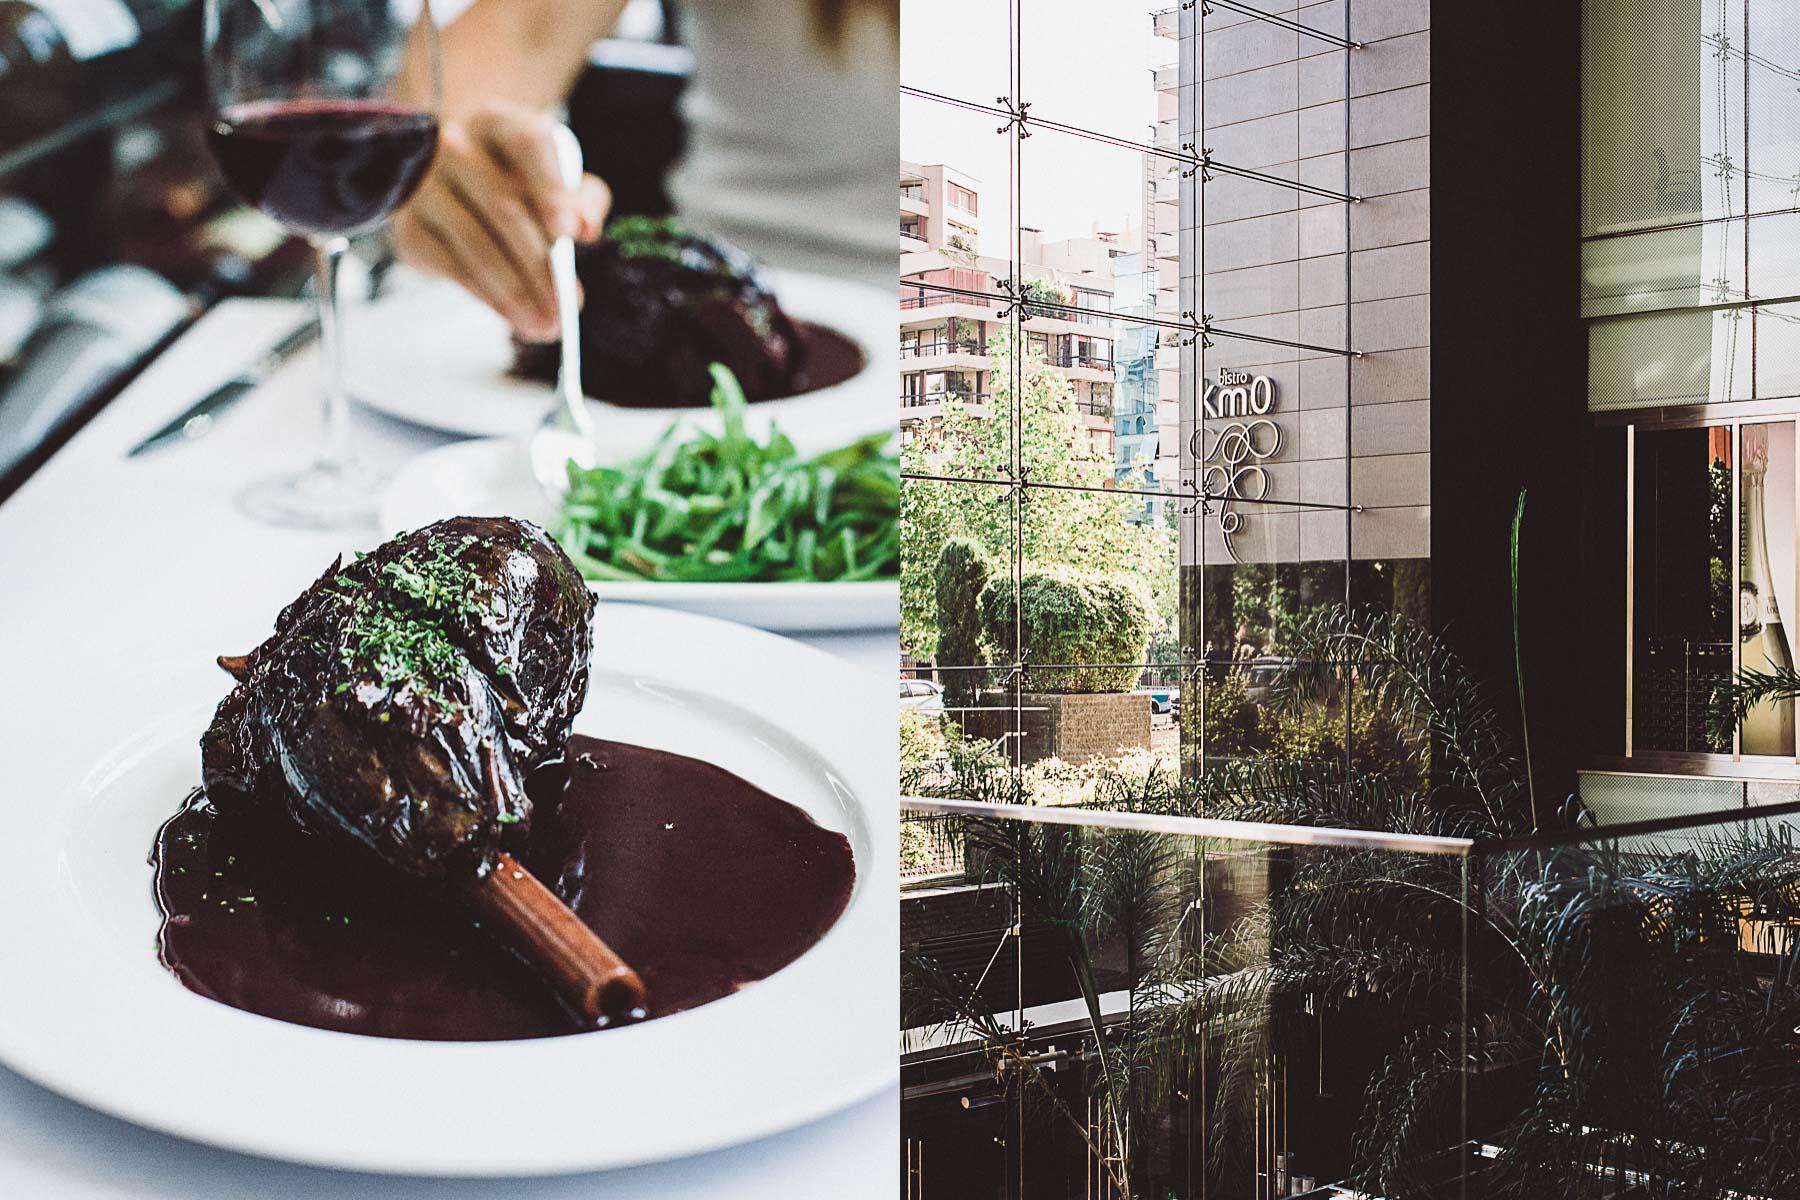 bistro-km-0-luxury-dining-santiago-chile-01